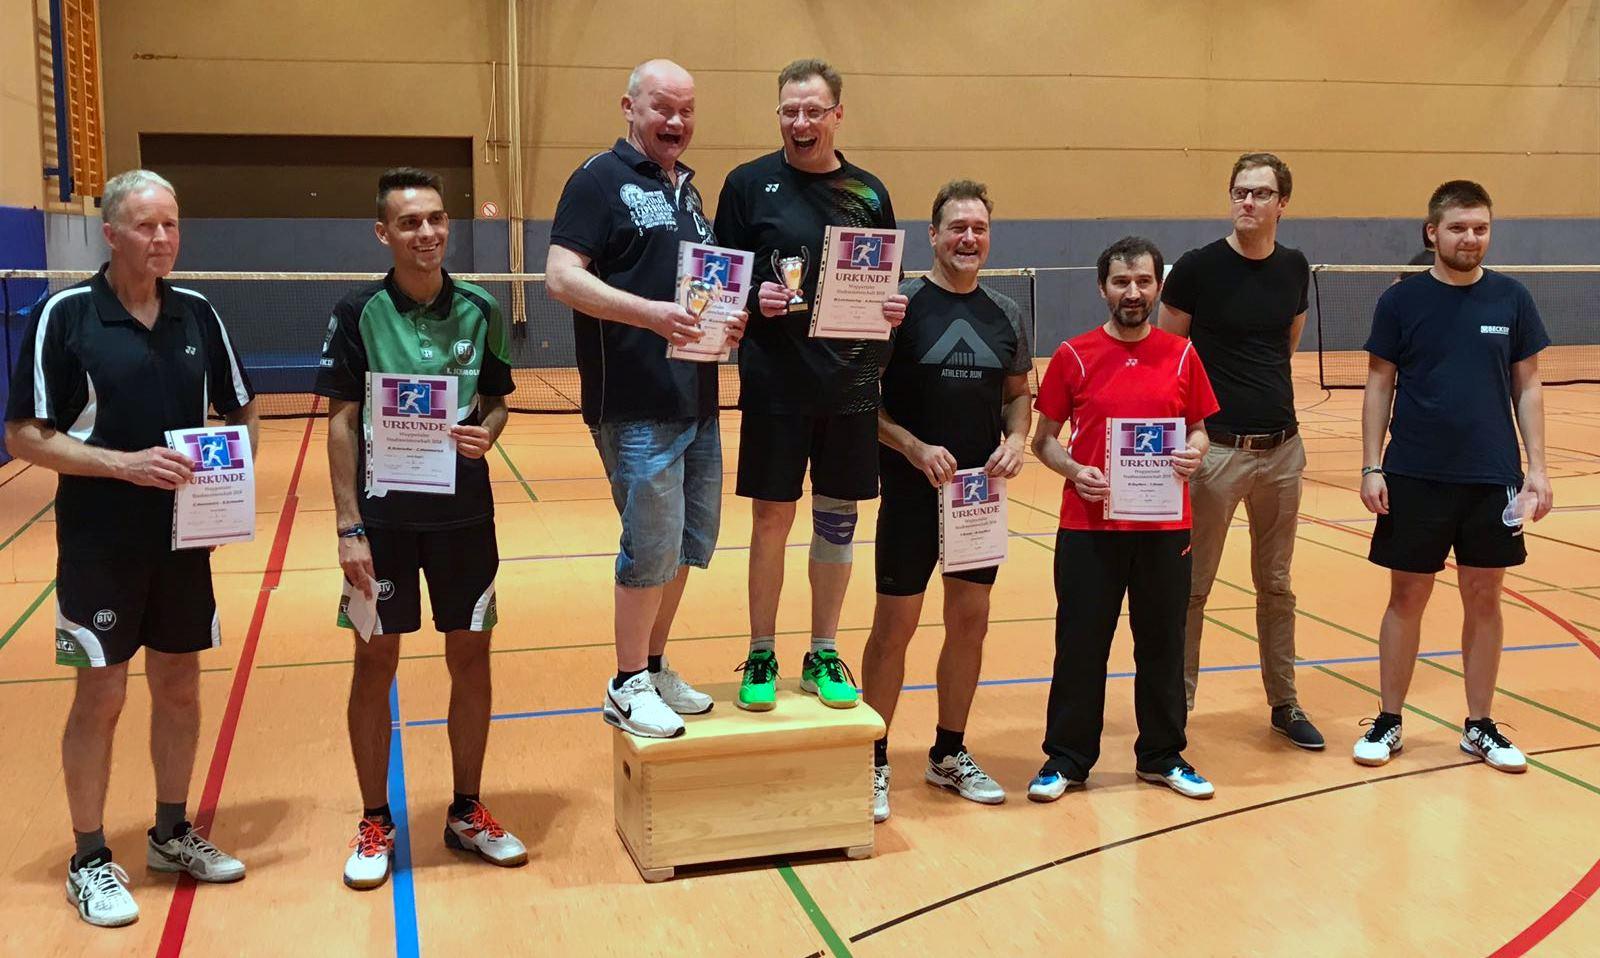 Siegerfoto Stadtmeister 2018 Herrendoppel C